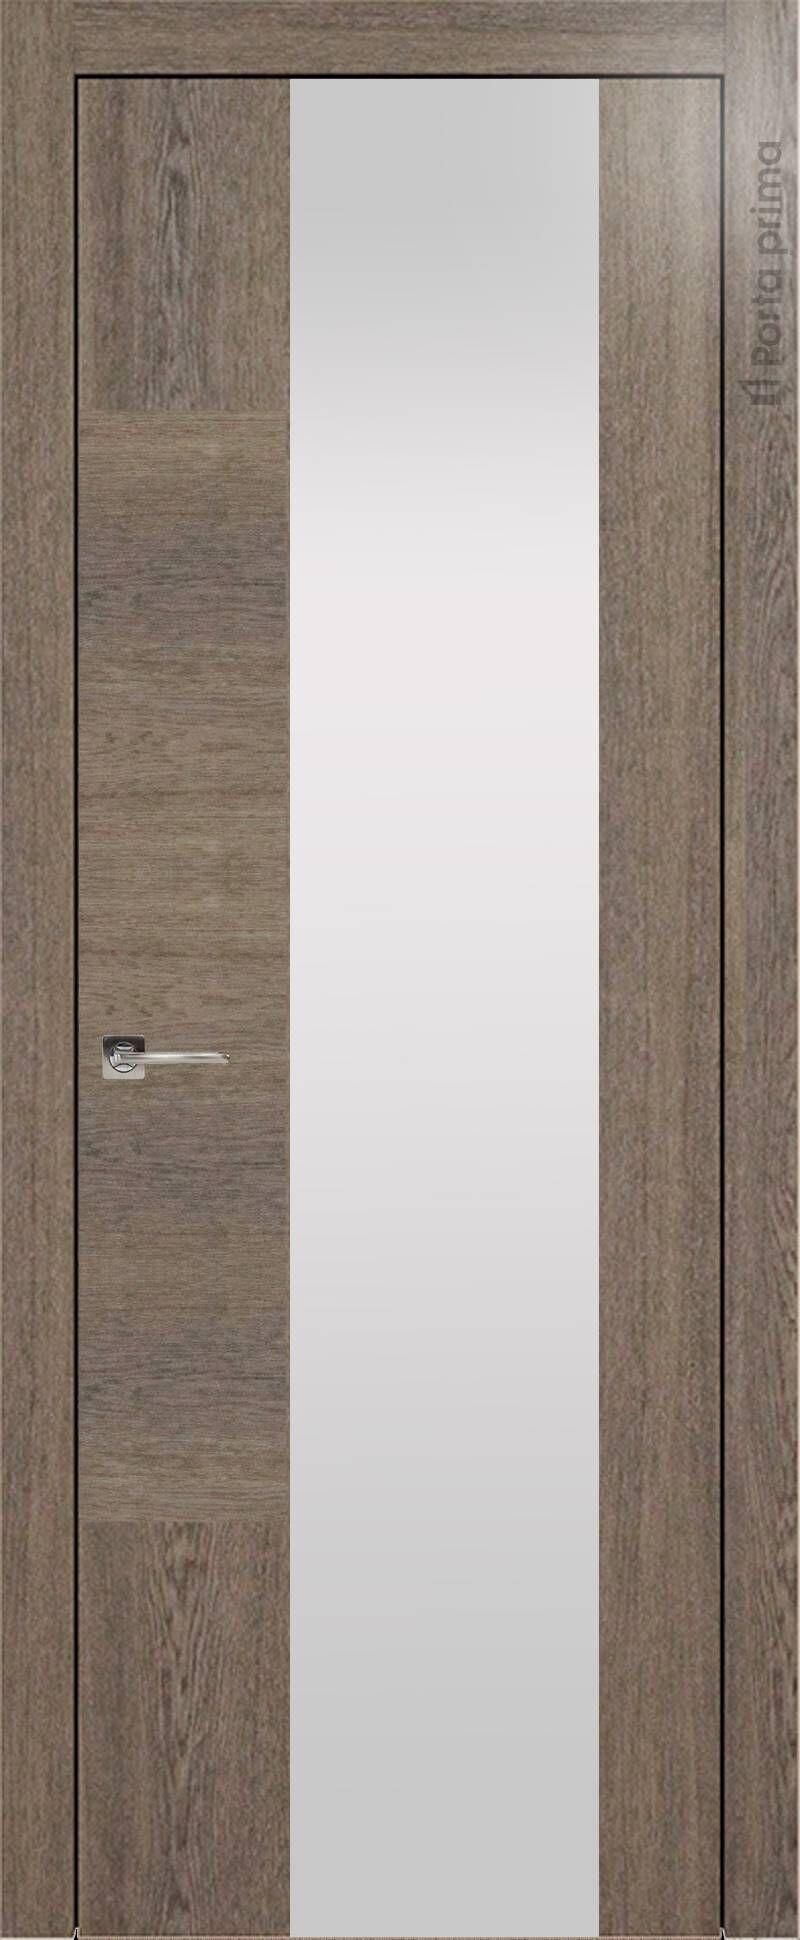 Tivoli Е-1 цвет - Дуб антик Со стеклом (ДО)